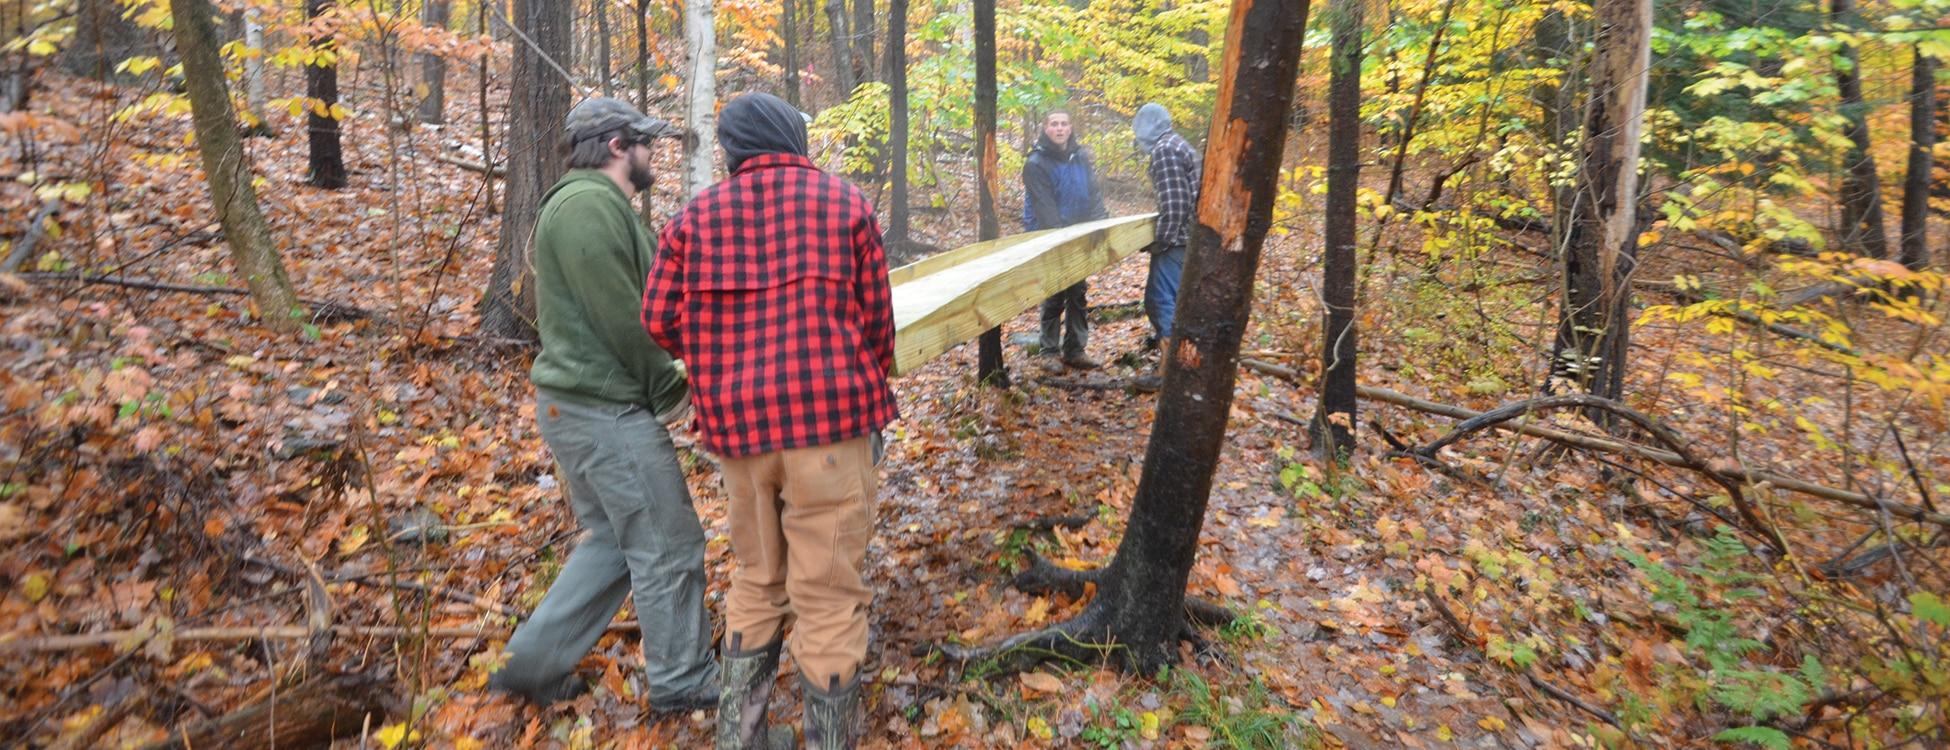 Hubbard Park, trail bridge, students working, teamwork, building